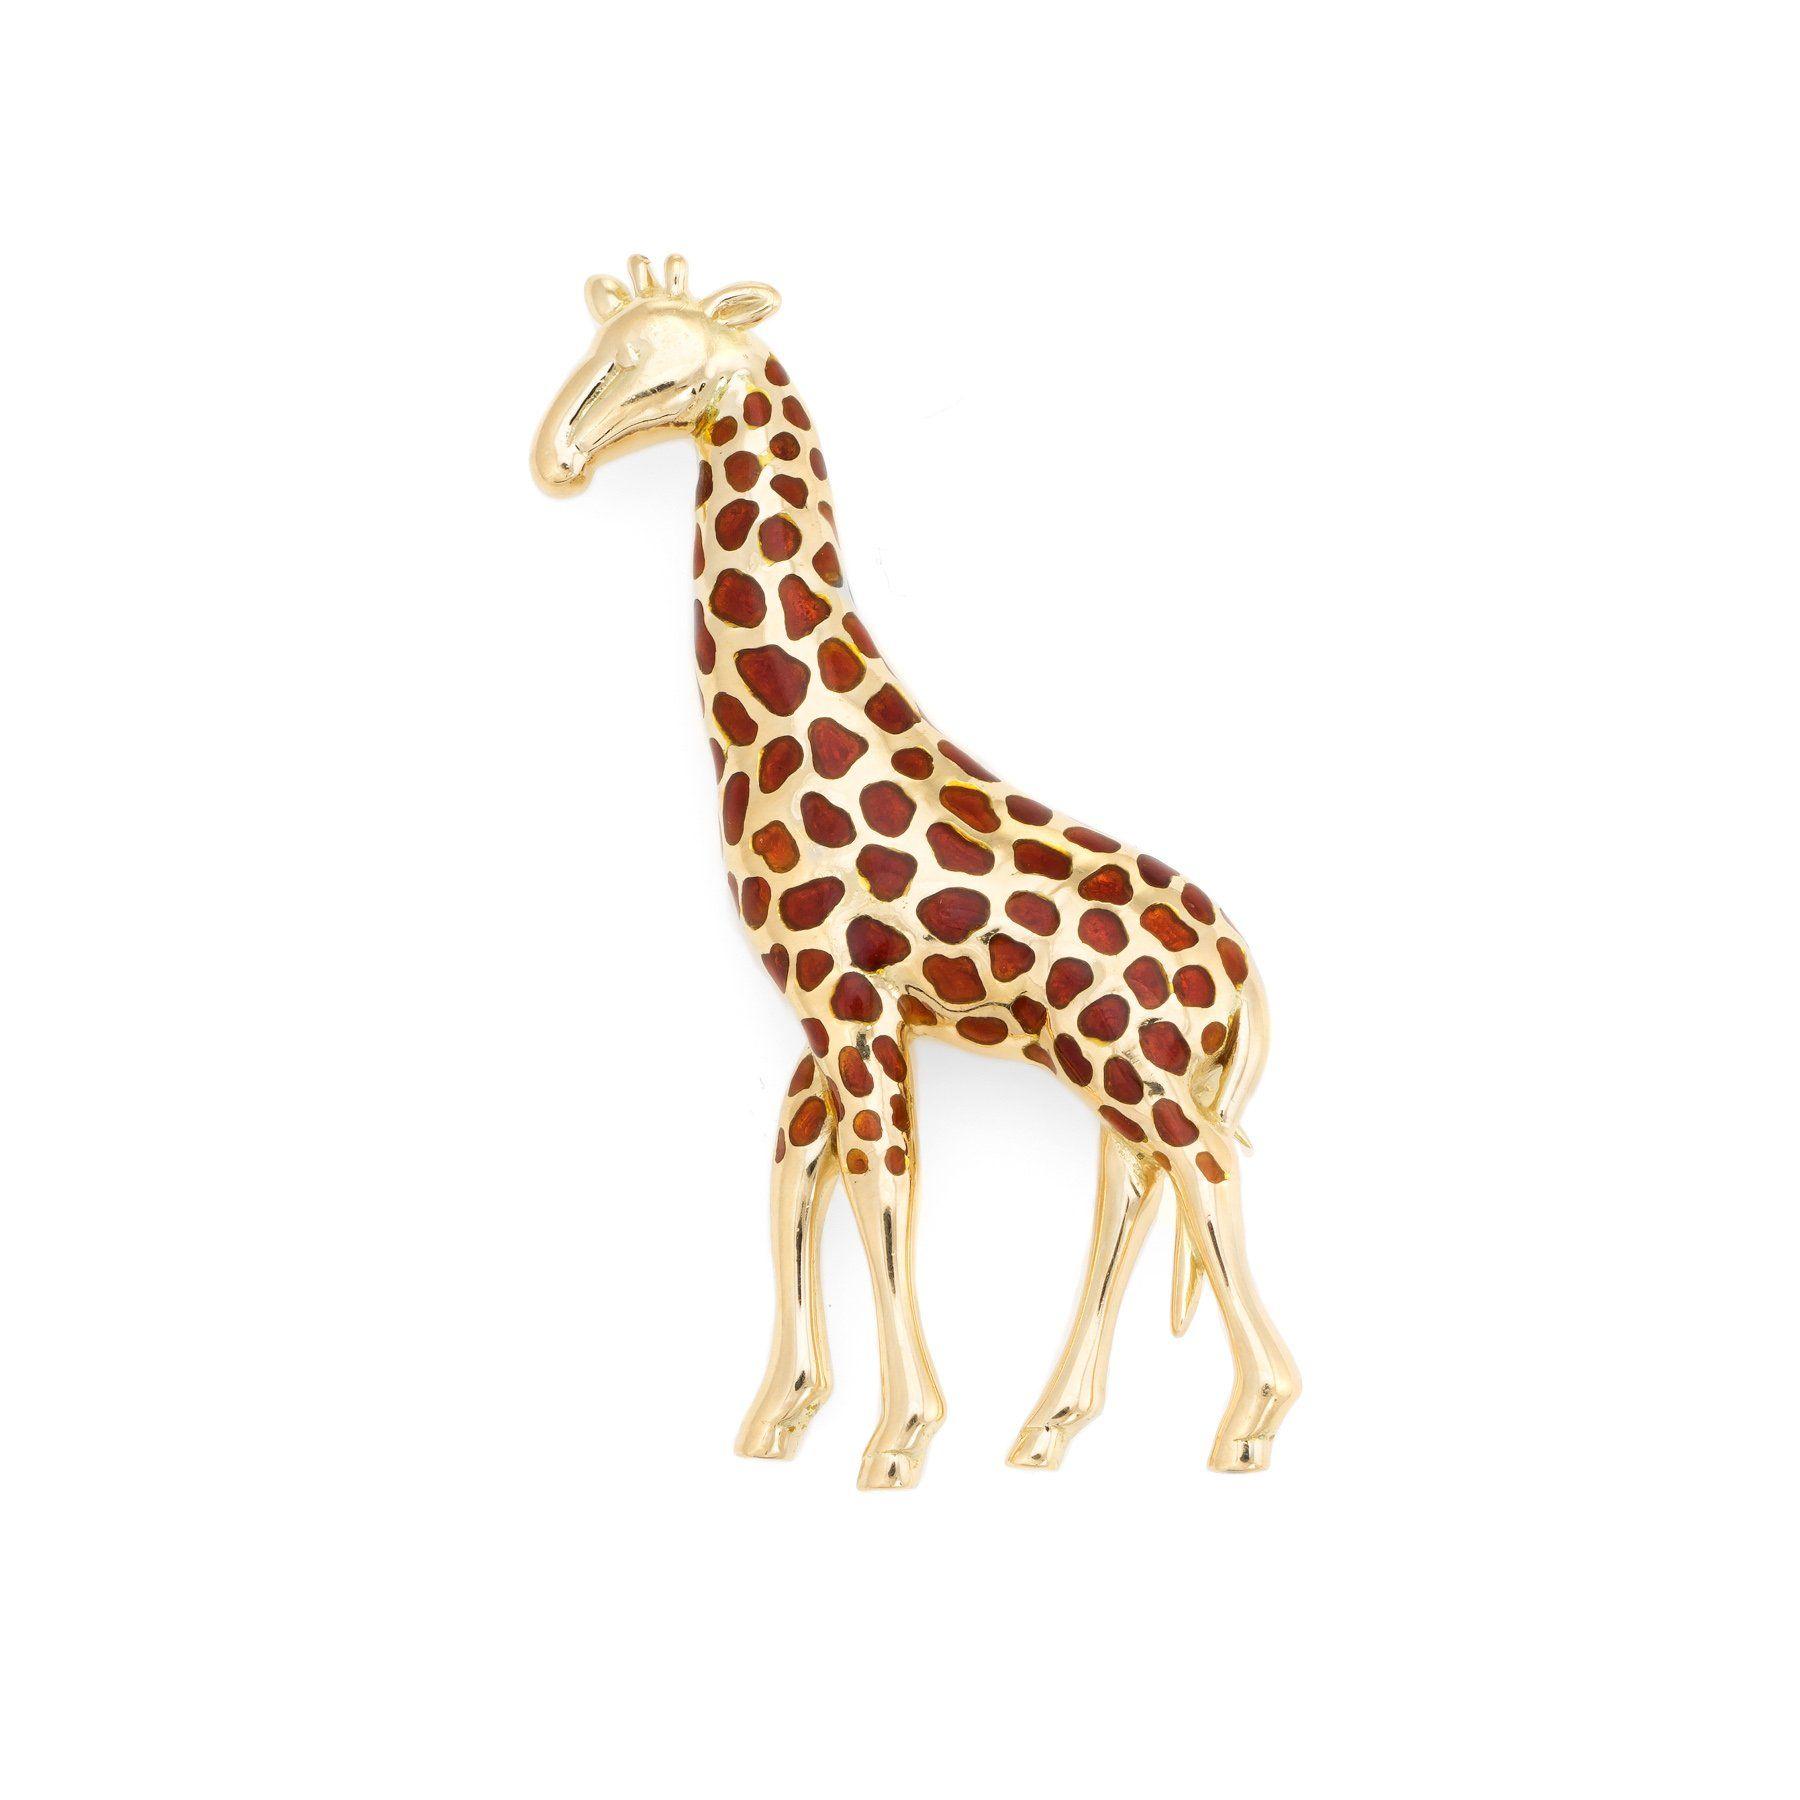 4e4faf20363cd Vintage Giraffe Brooch 18k Yellow Gold Pin Animal Jewelry Estate ...